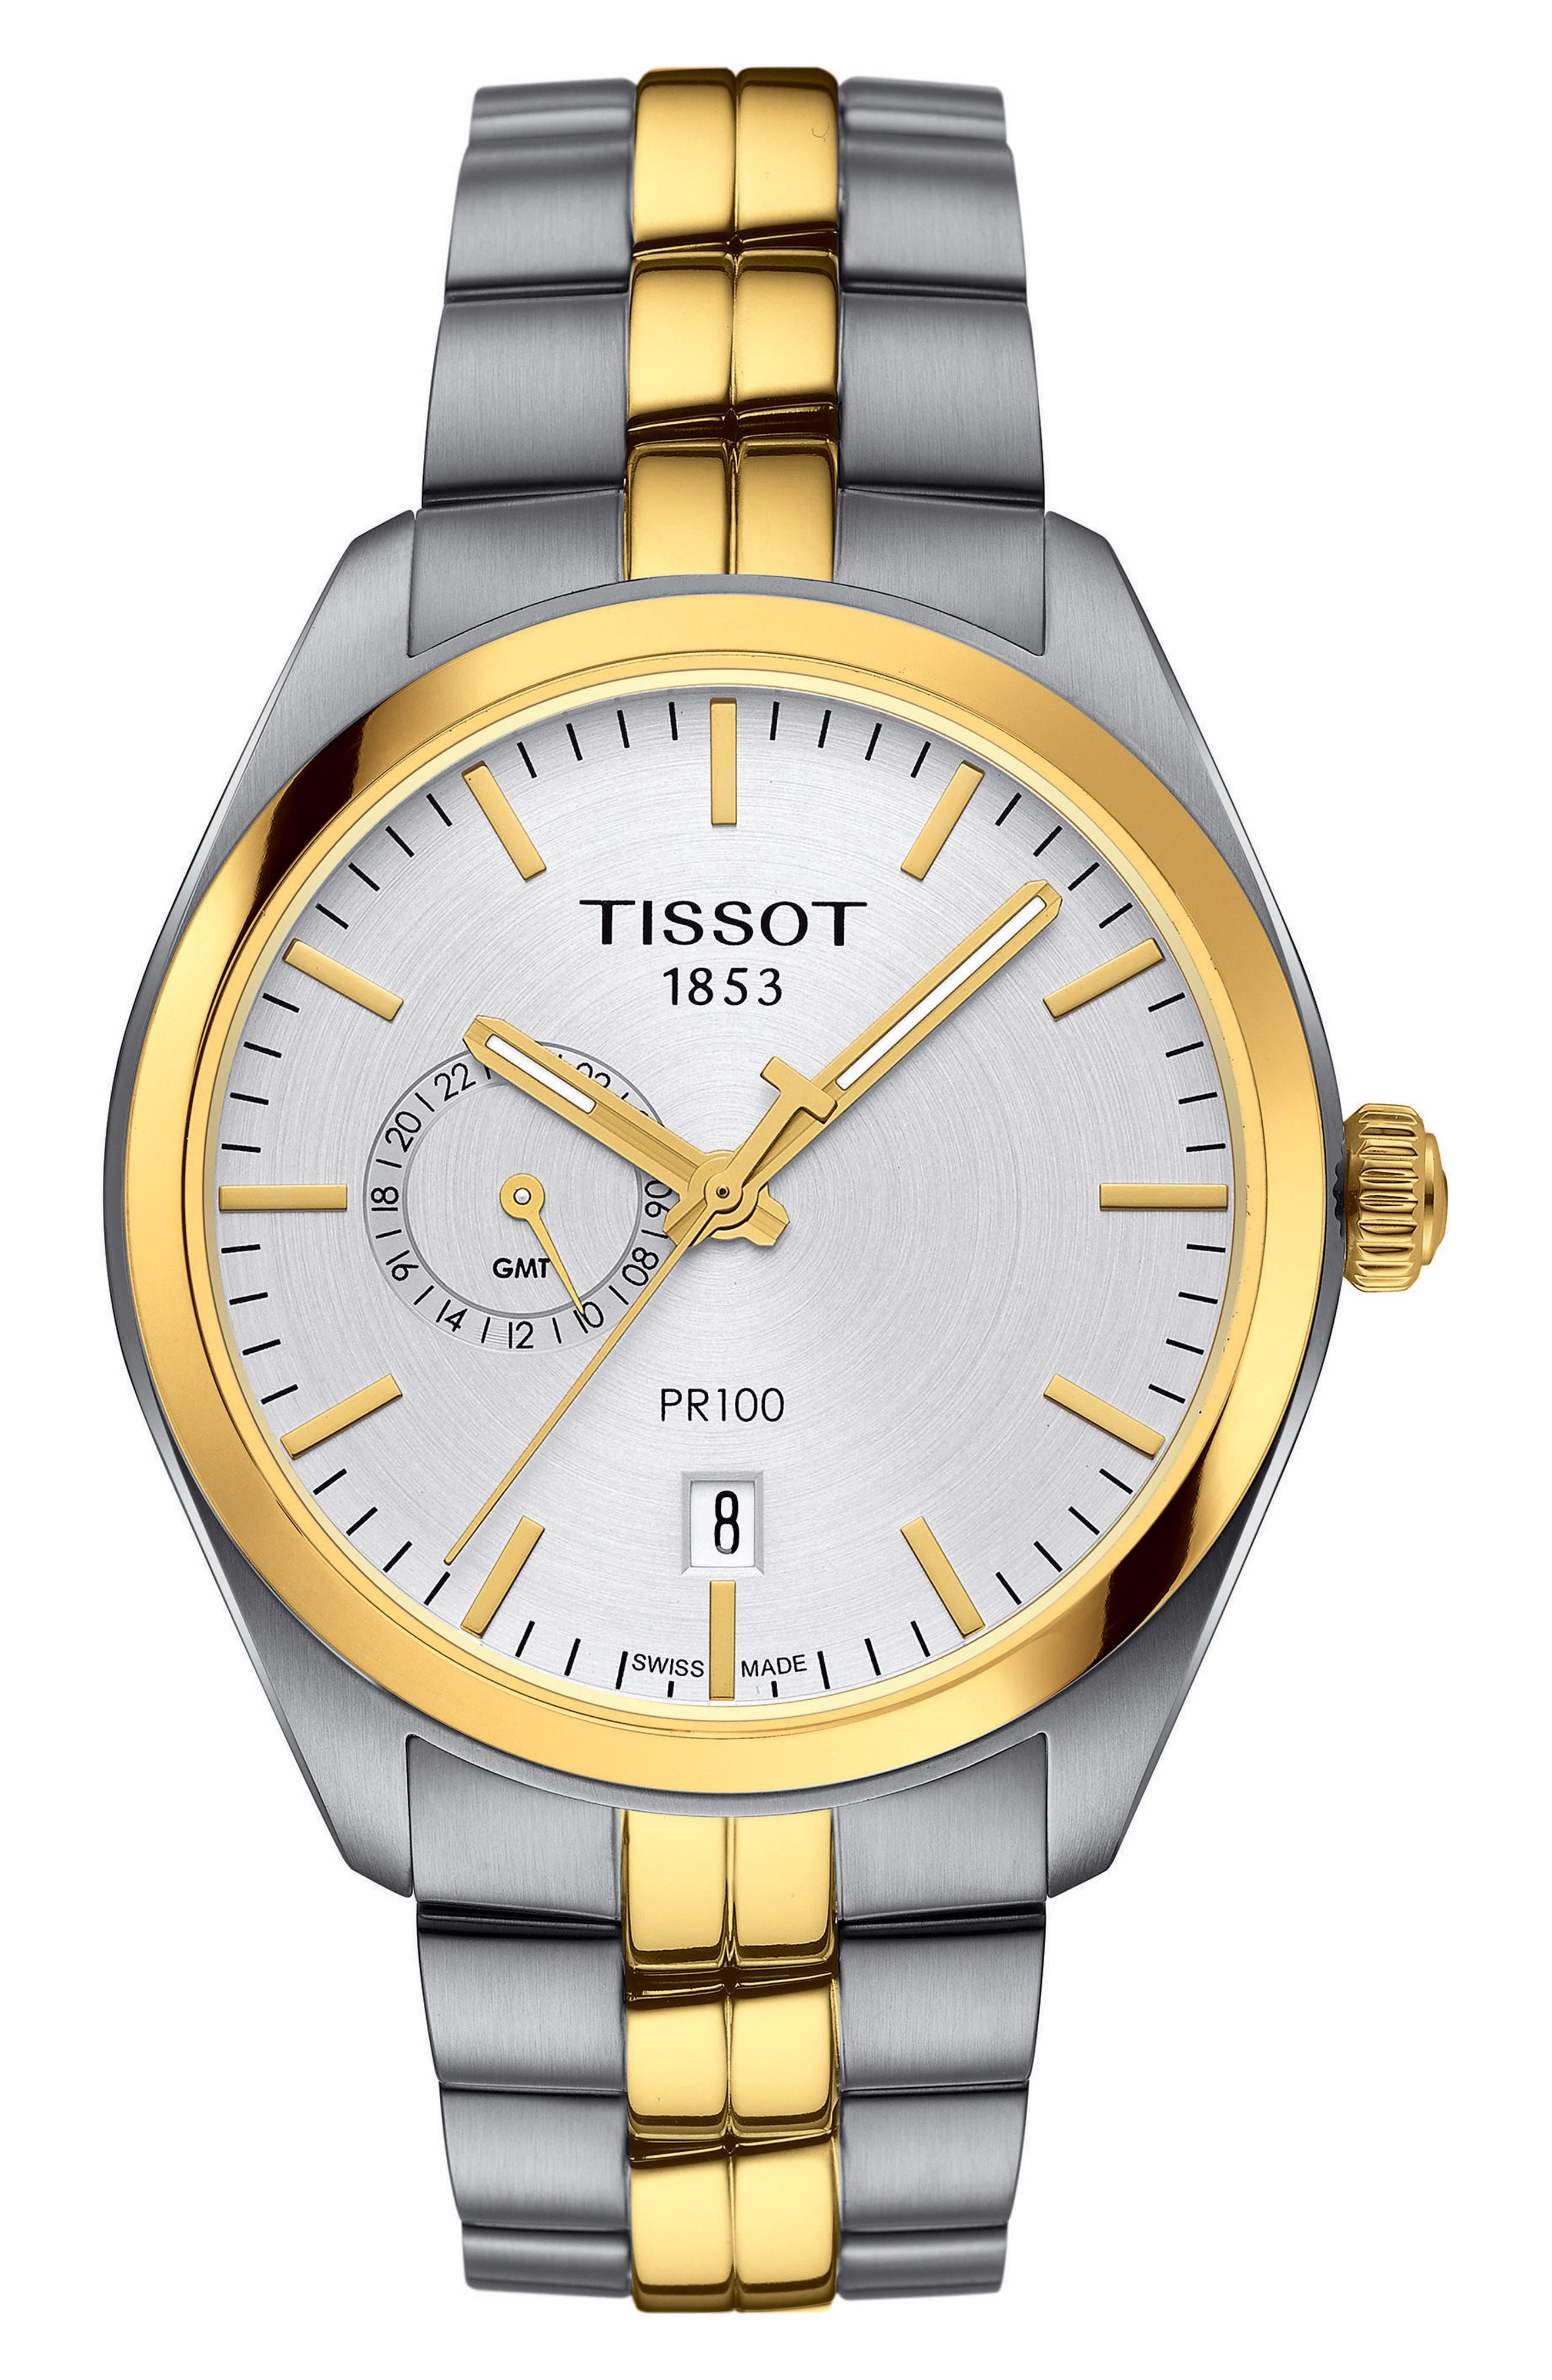 Main Image - Tissot PR100 Bracelet Watch, 39mm